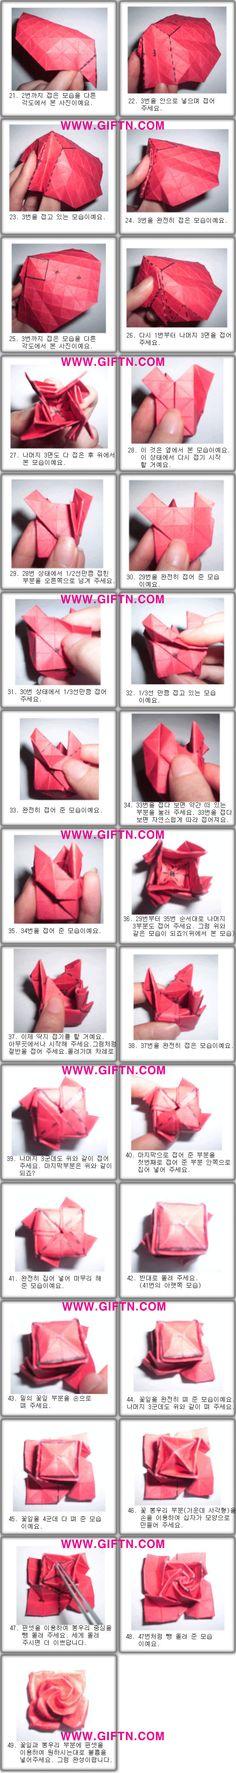 Origami rose <종이접기>장미 접는 방법2 : 네이버 블로그